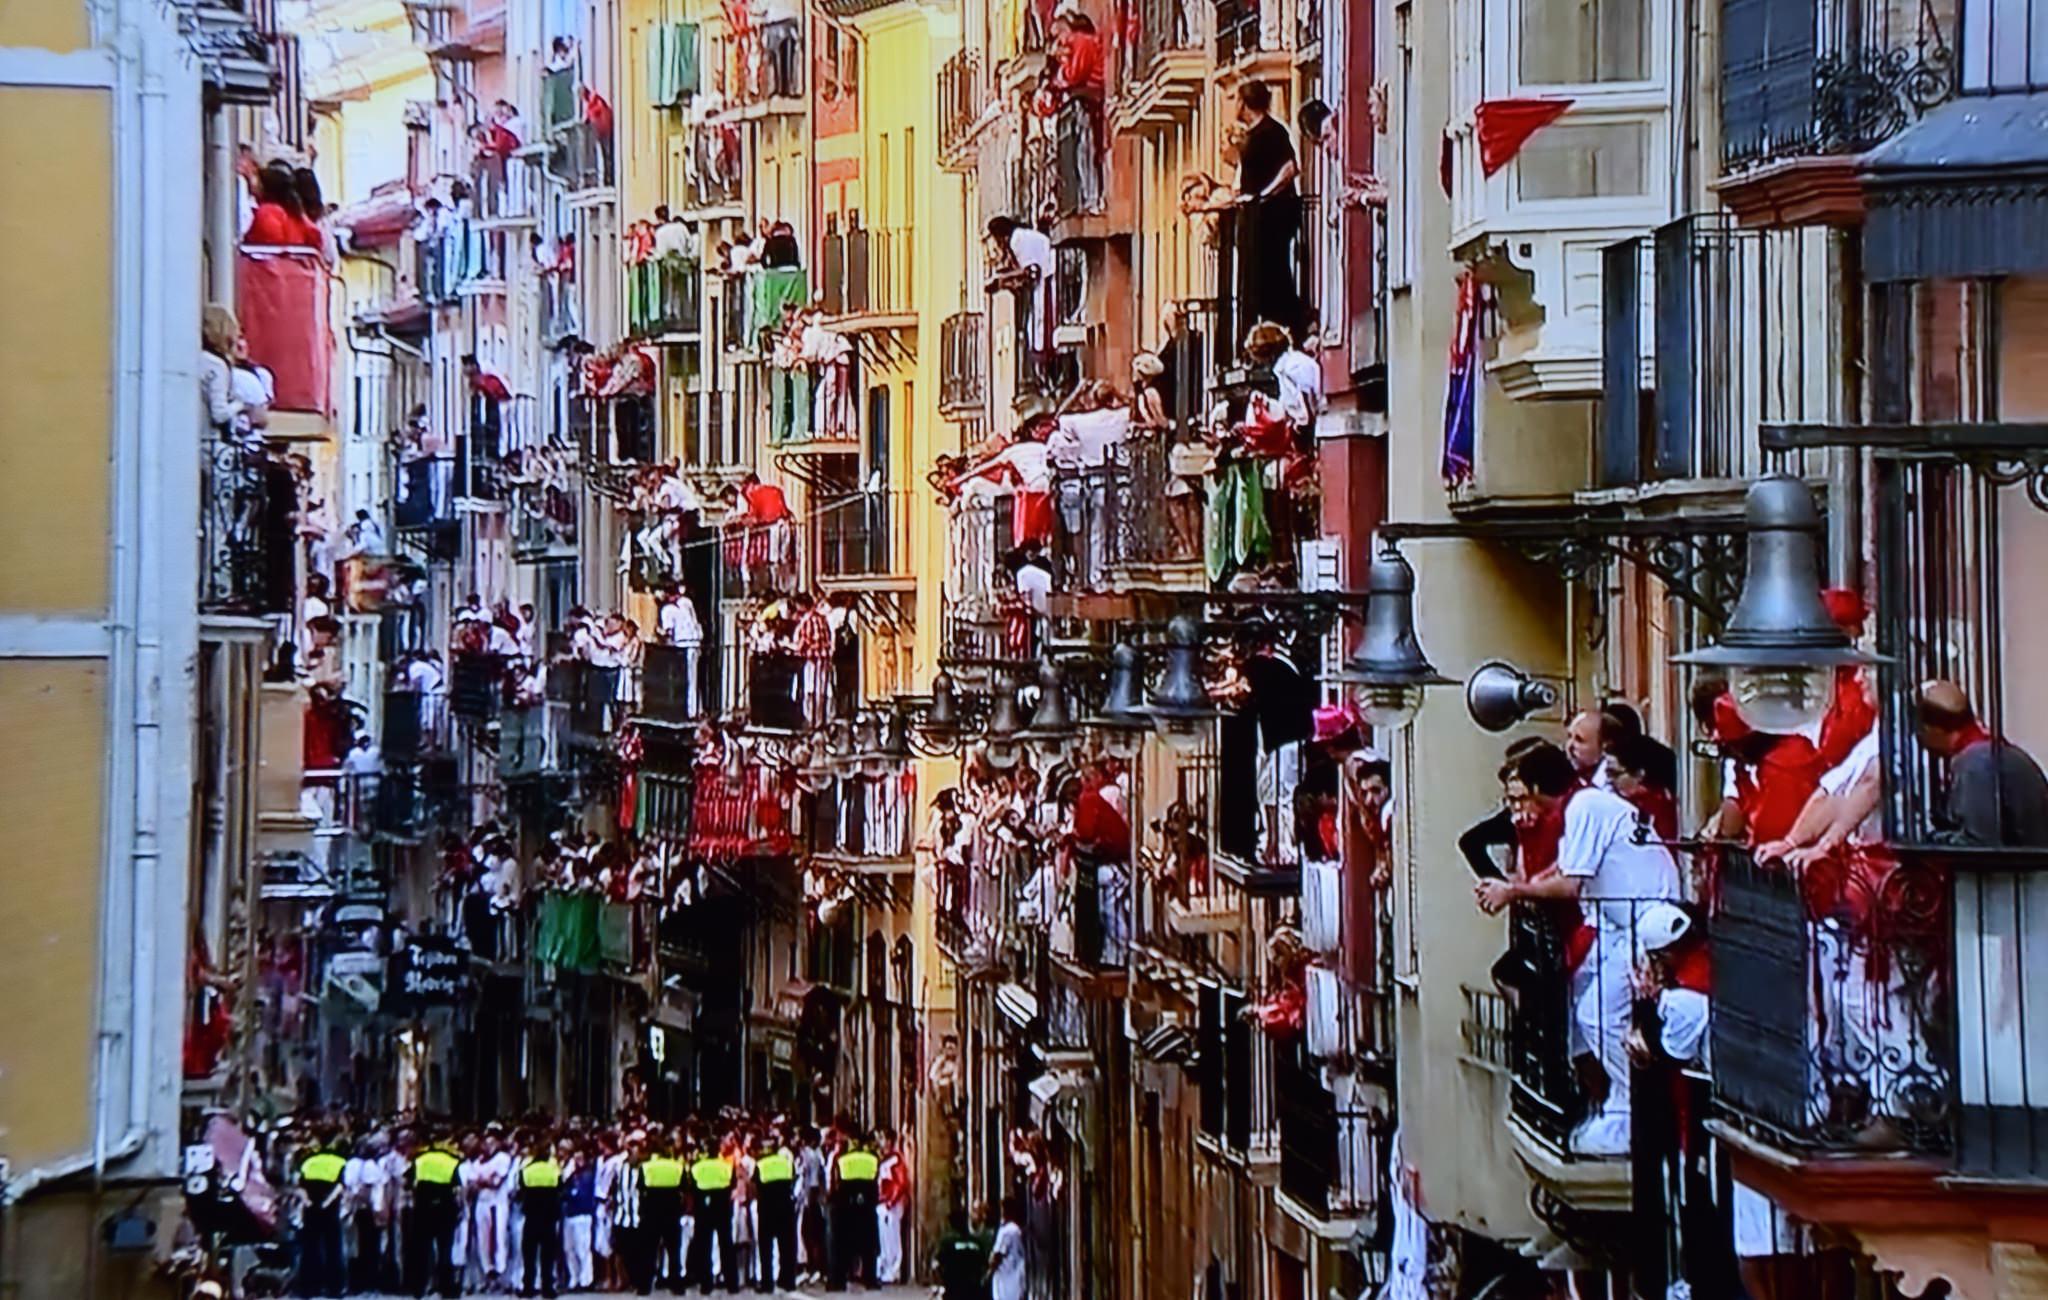 Balconies during San Fermin, Pamplona | ©Marcela Escandell / Flickr